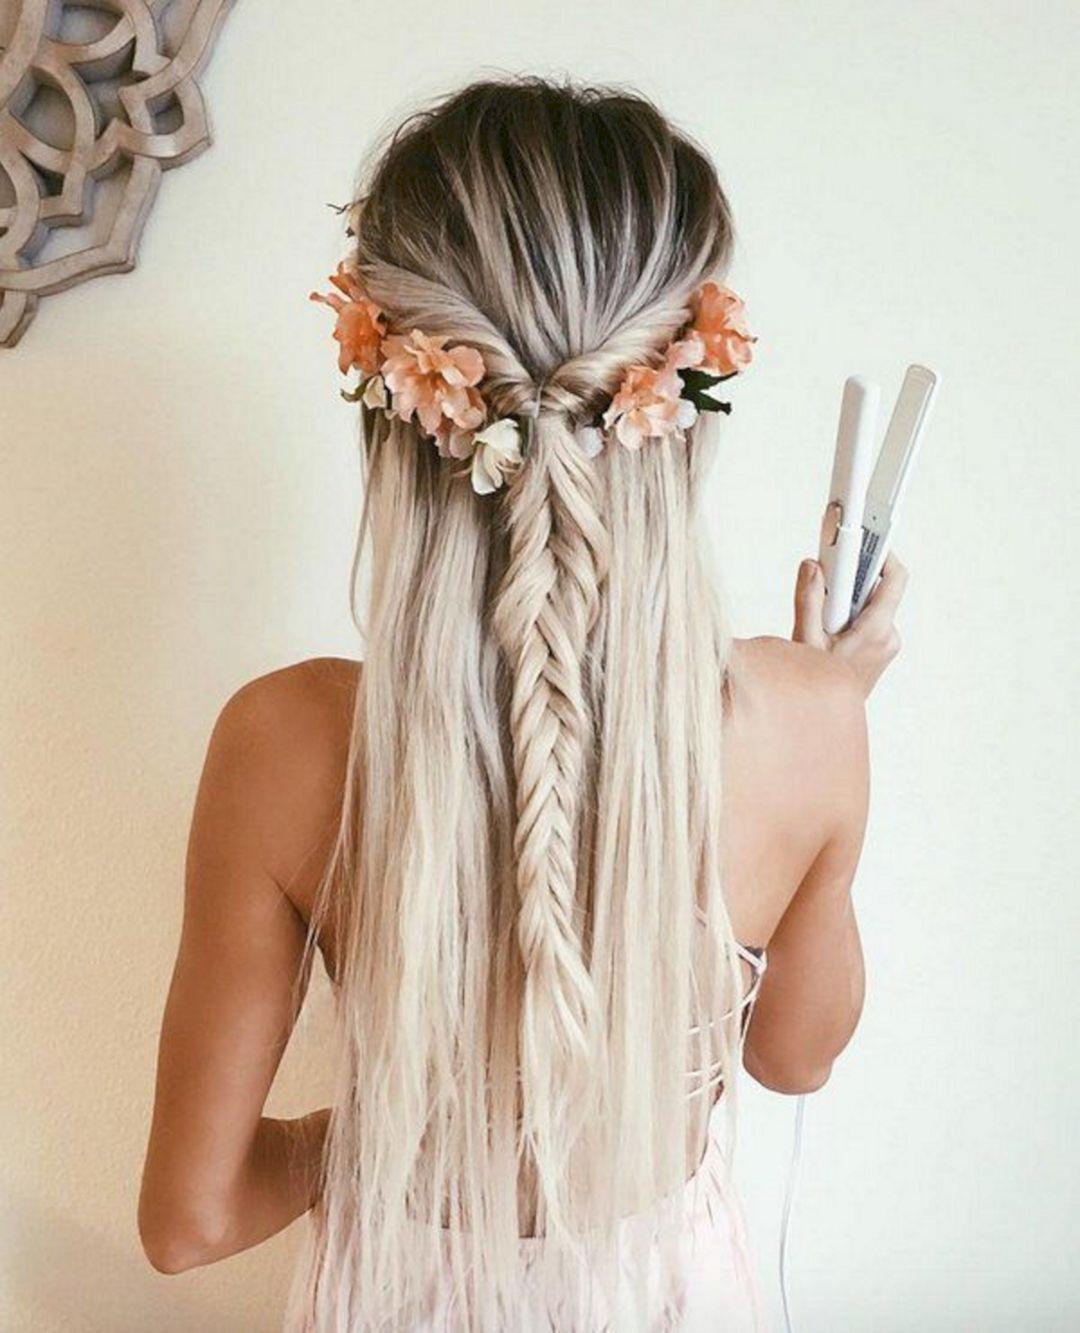 Stunning half up half down wedding hairstyles ideas no 07 | Bridal ...